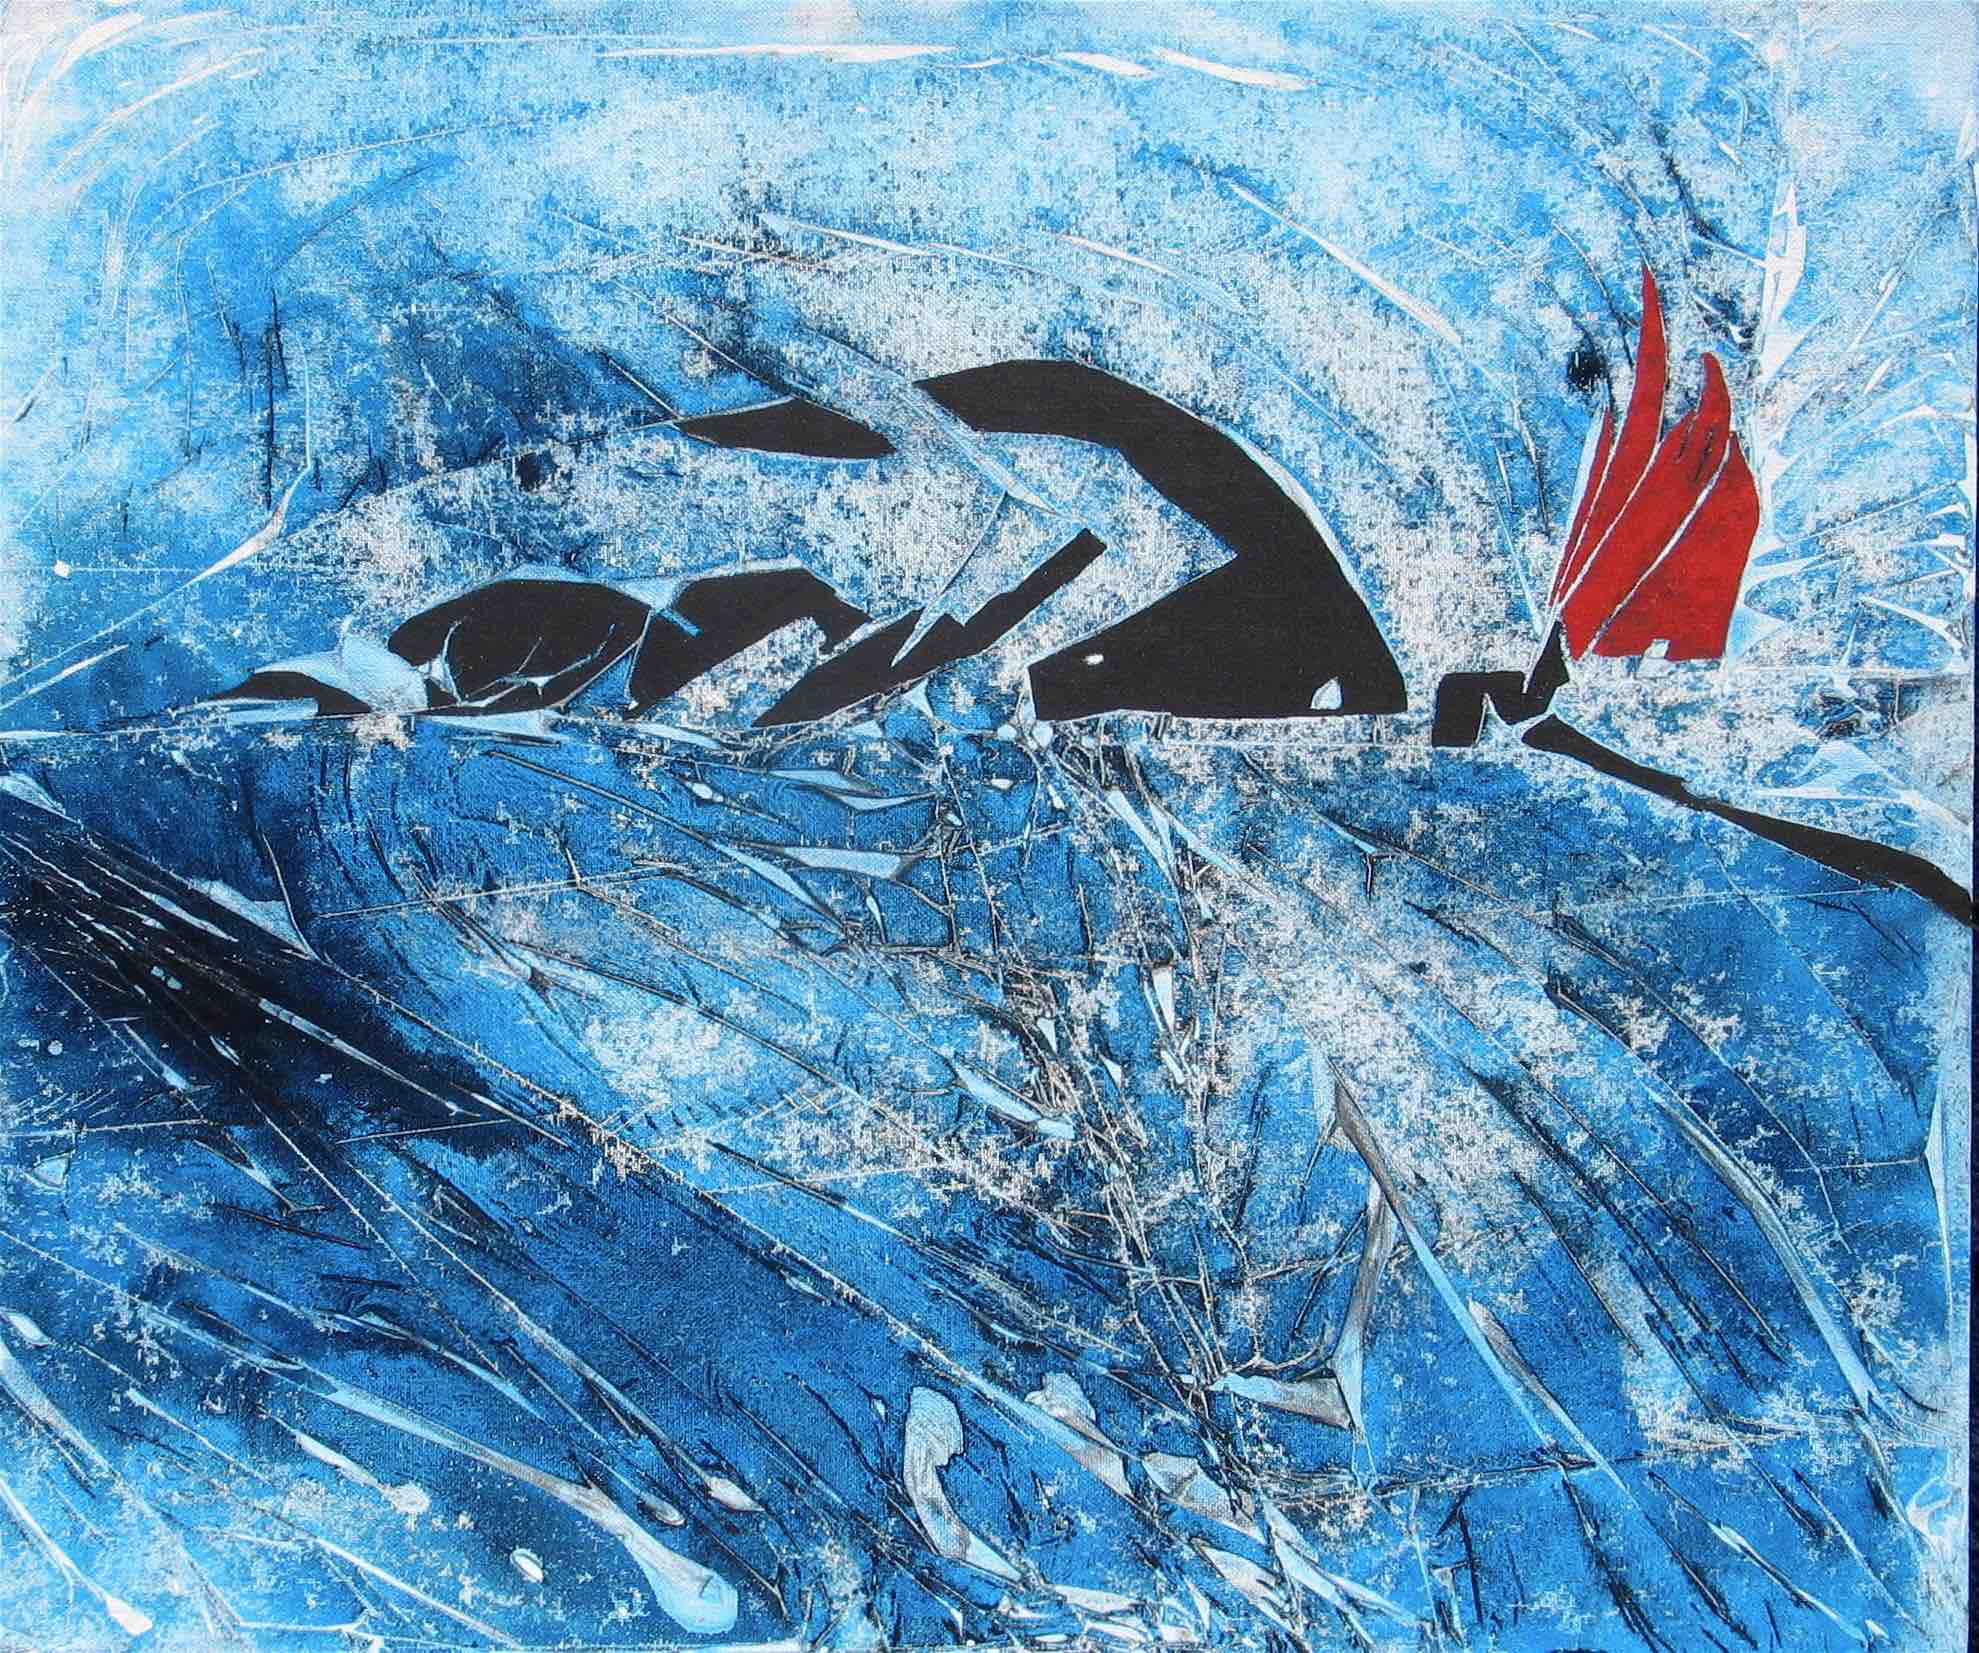 The Swimmer : 60 X 50 cm acrylic on board